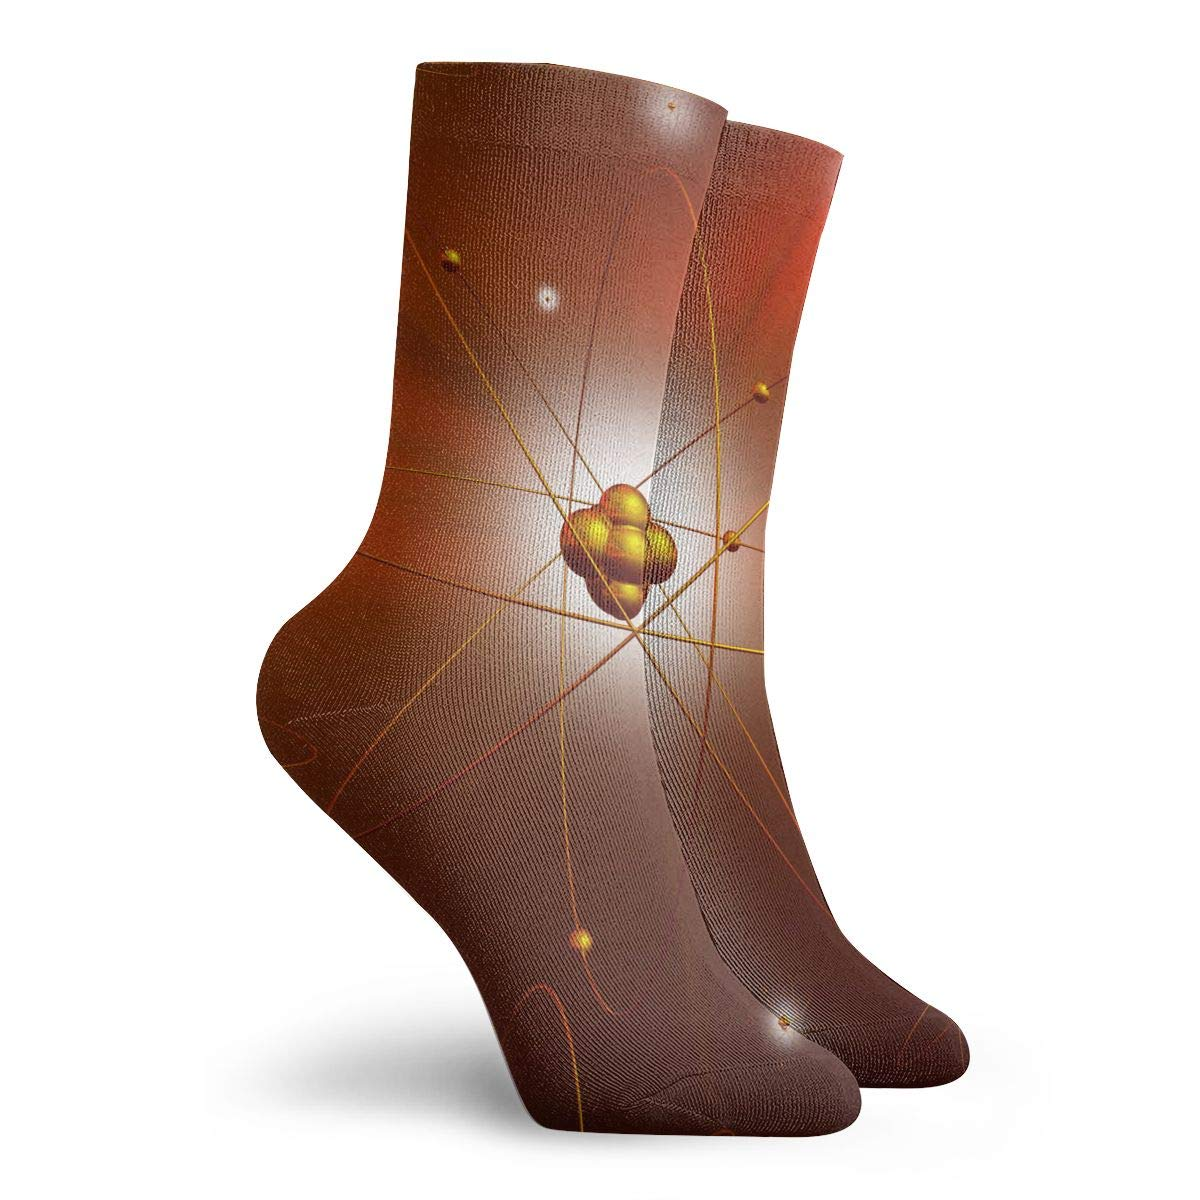 SESY Science Chemistry Molecule DNA Unisex Crew Socks Short Sports Stocking